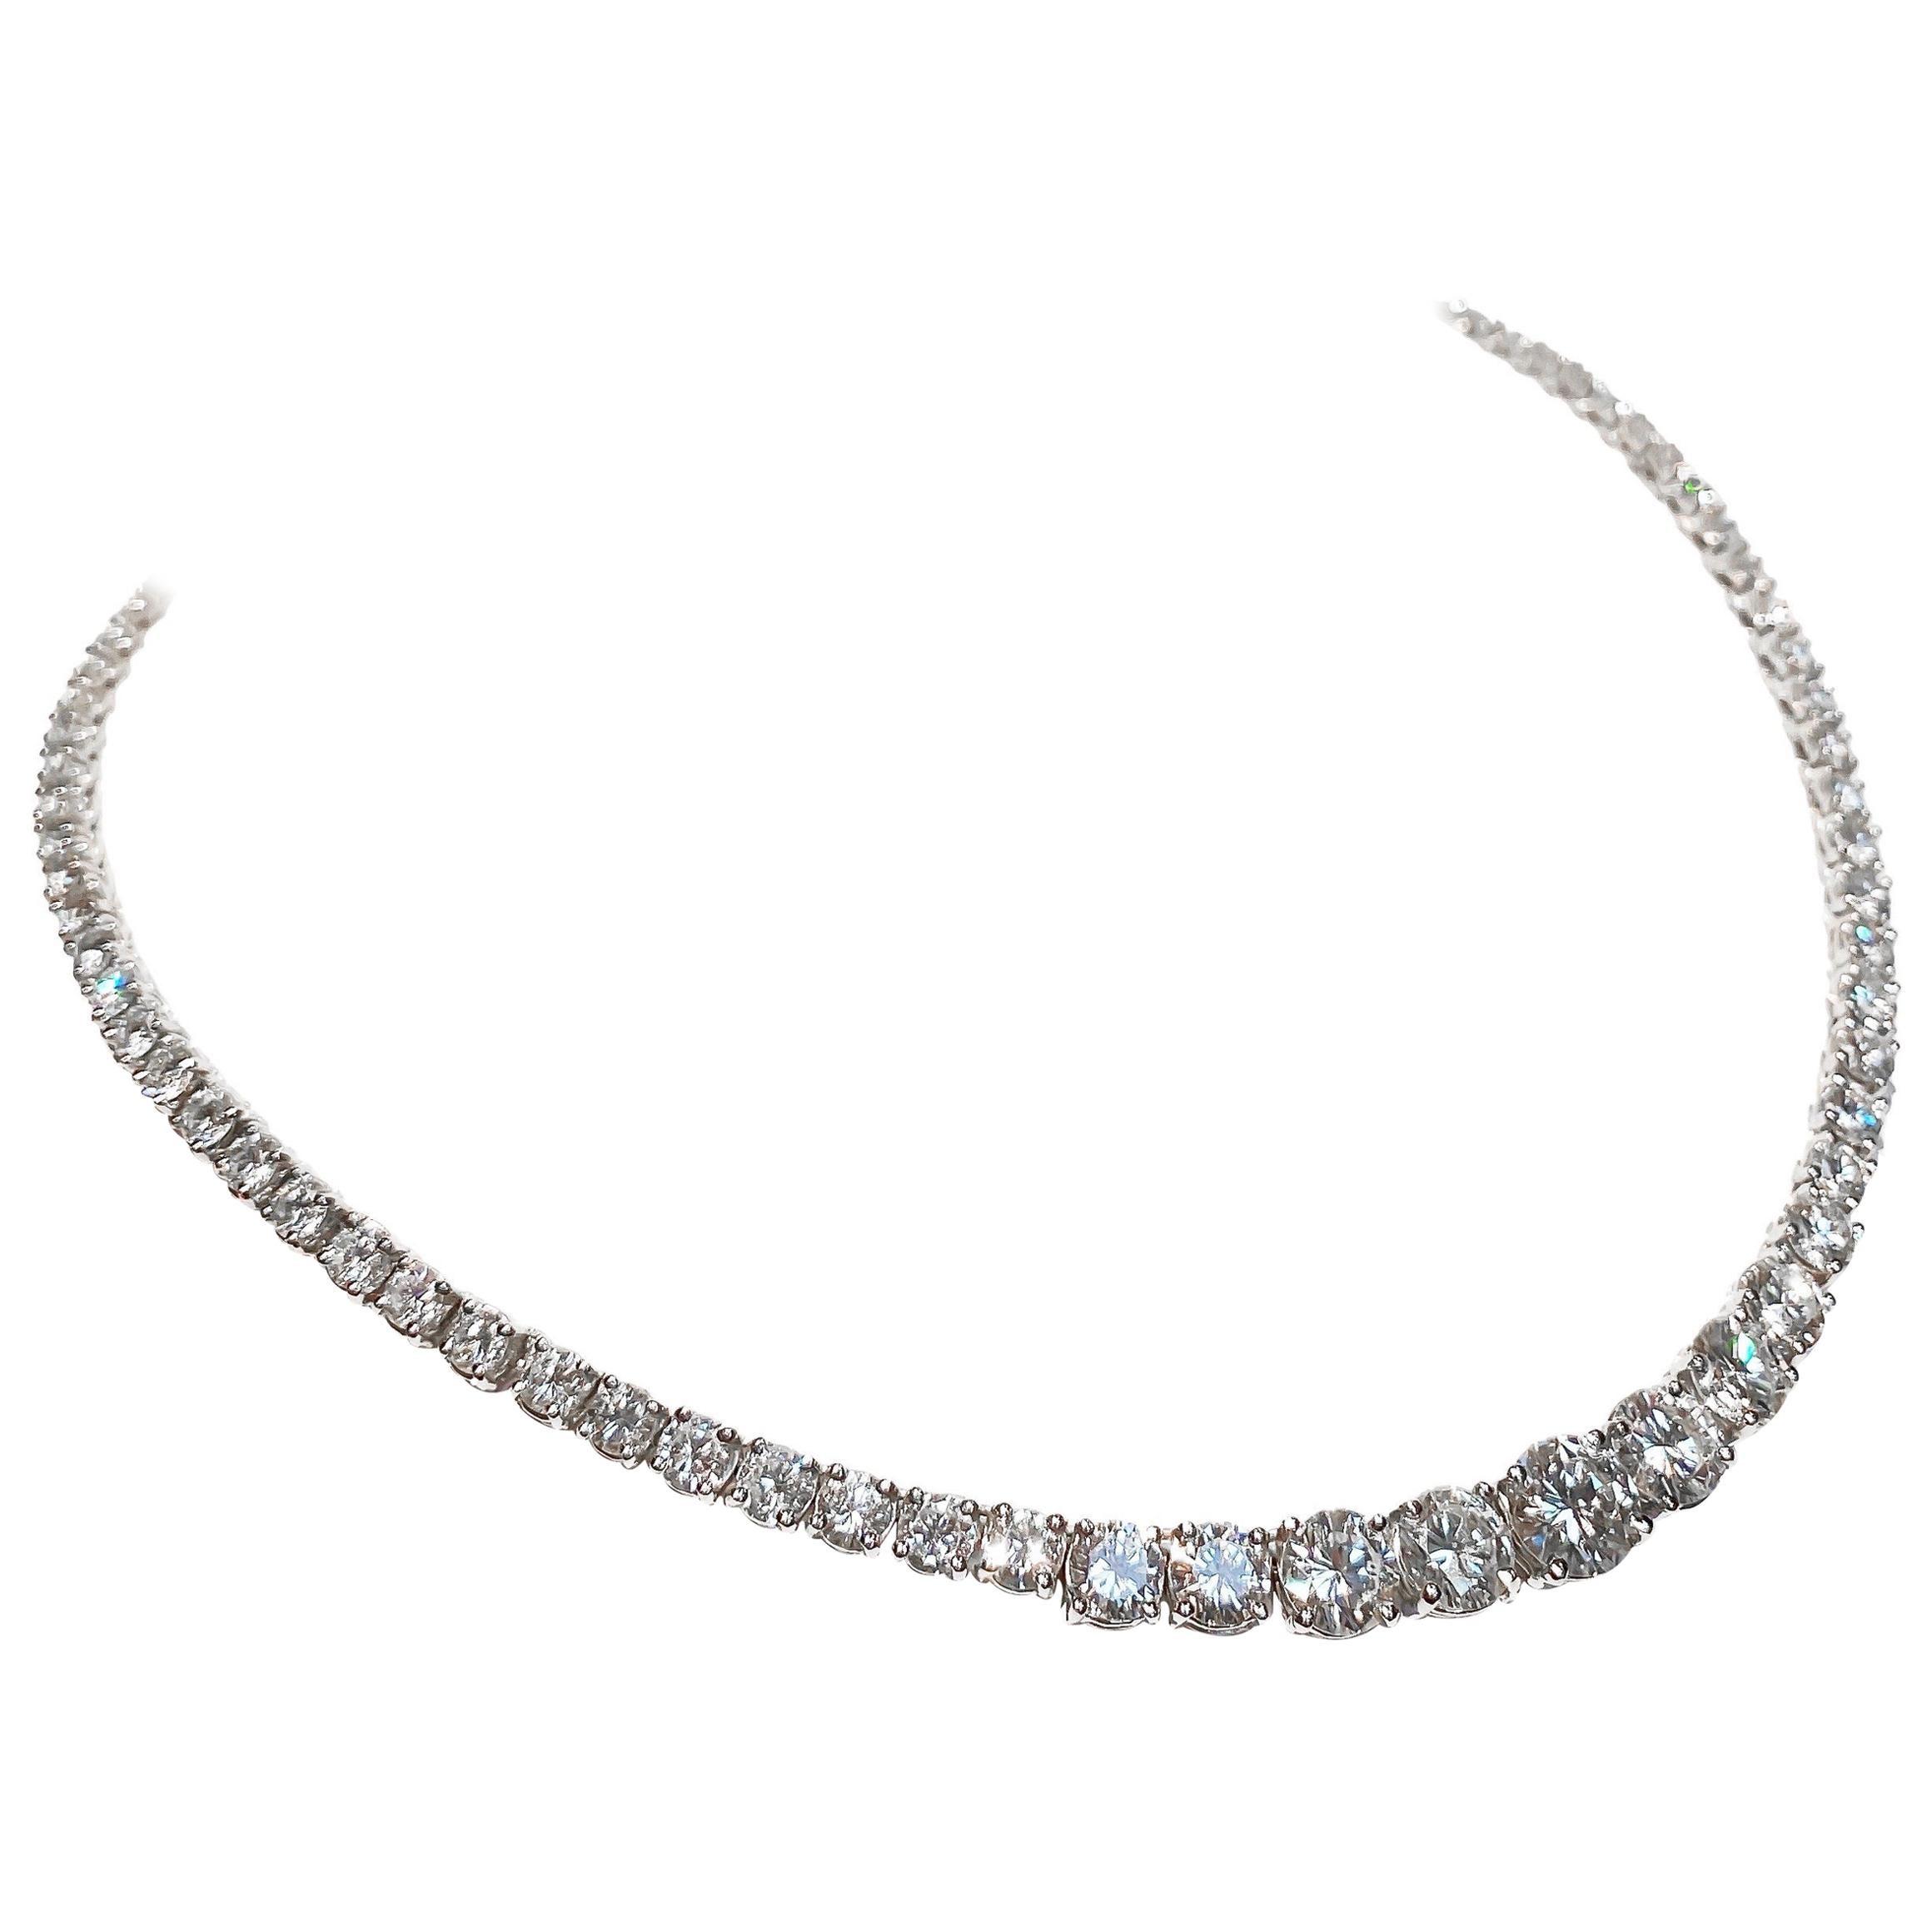 Graduated Platinum 21 Carat Riviera Necklace